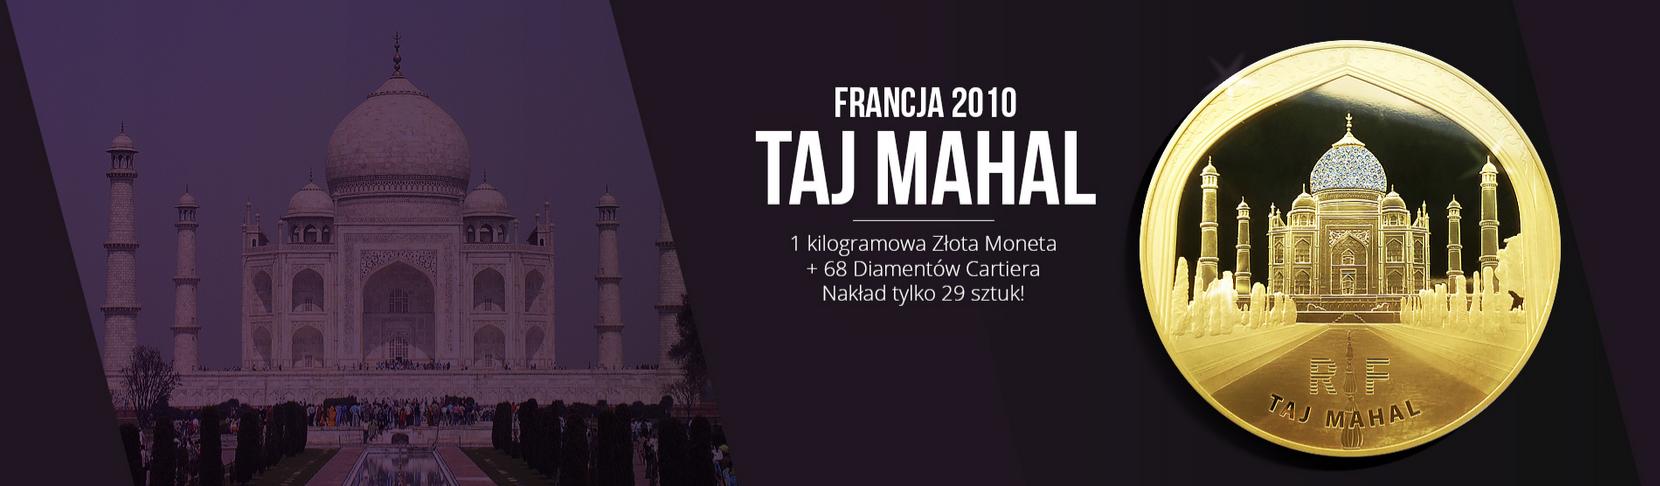 Francja_2010_5000_Euro_Taj_Mahal_68_Diam